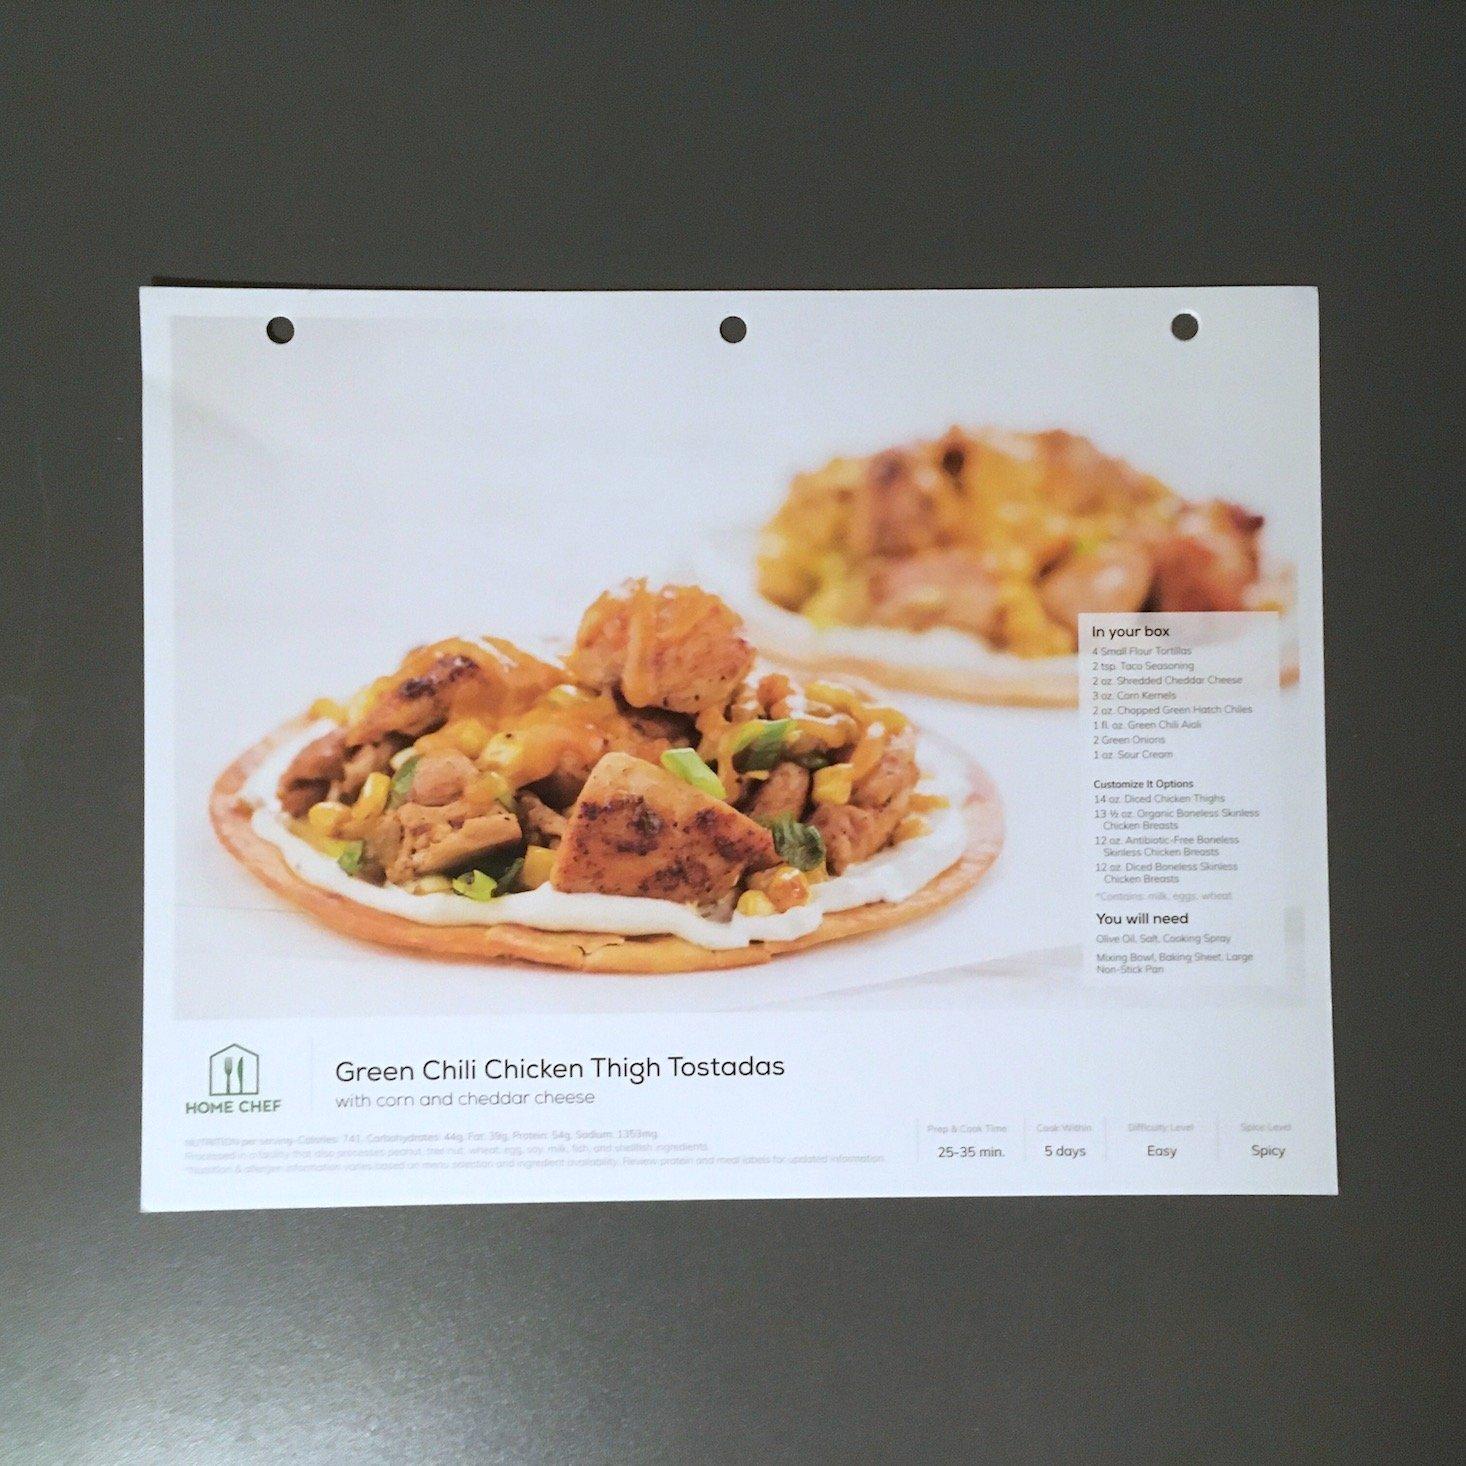 Home Chef February 2020 - chicken thigh tostadas recipe card front